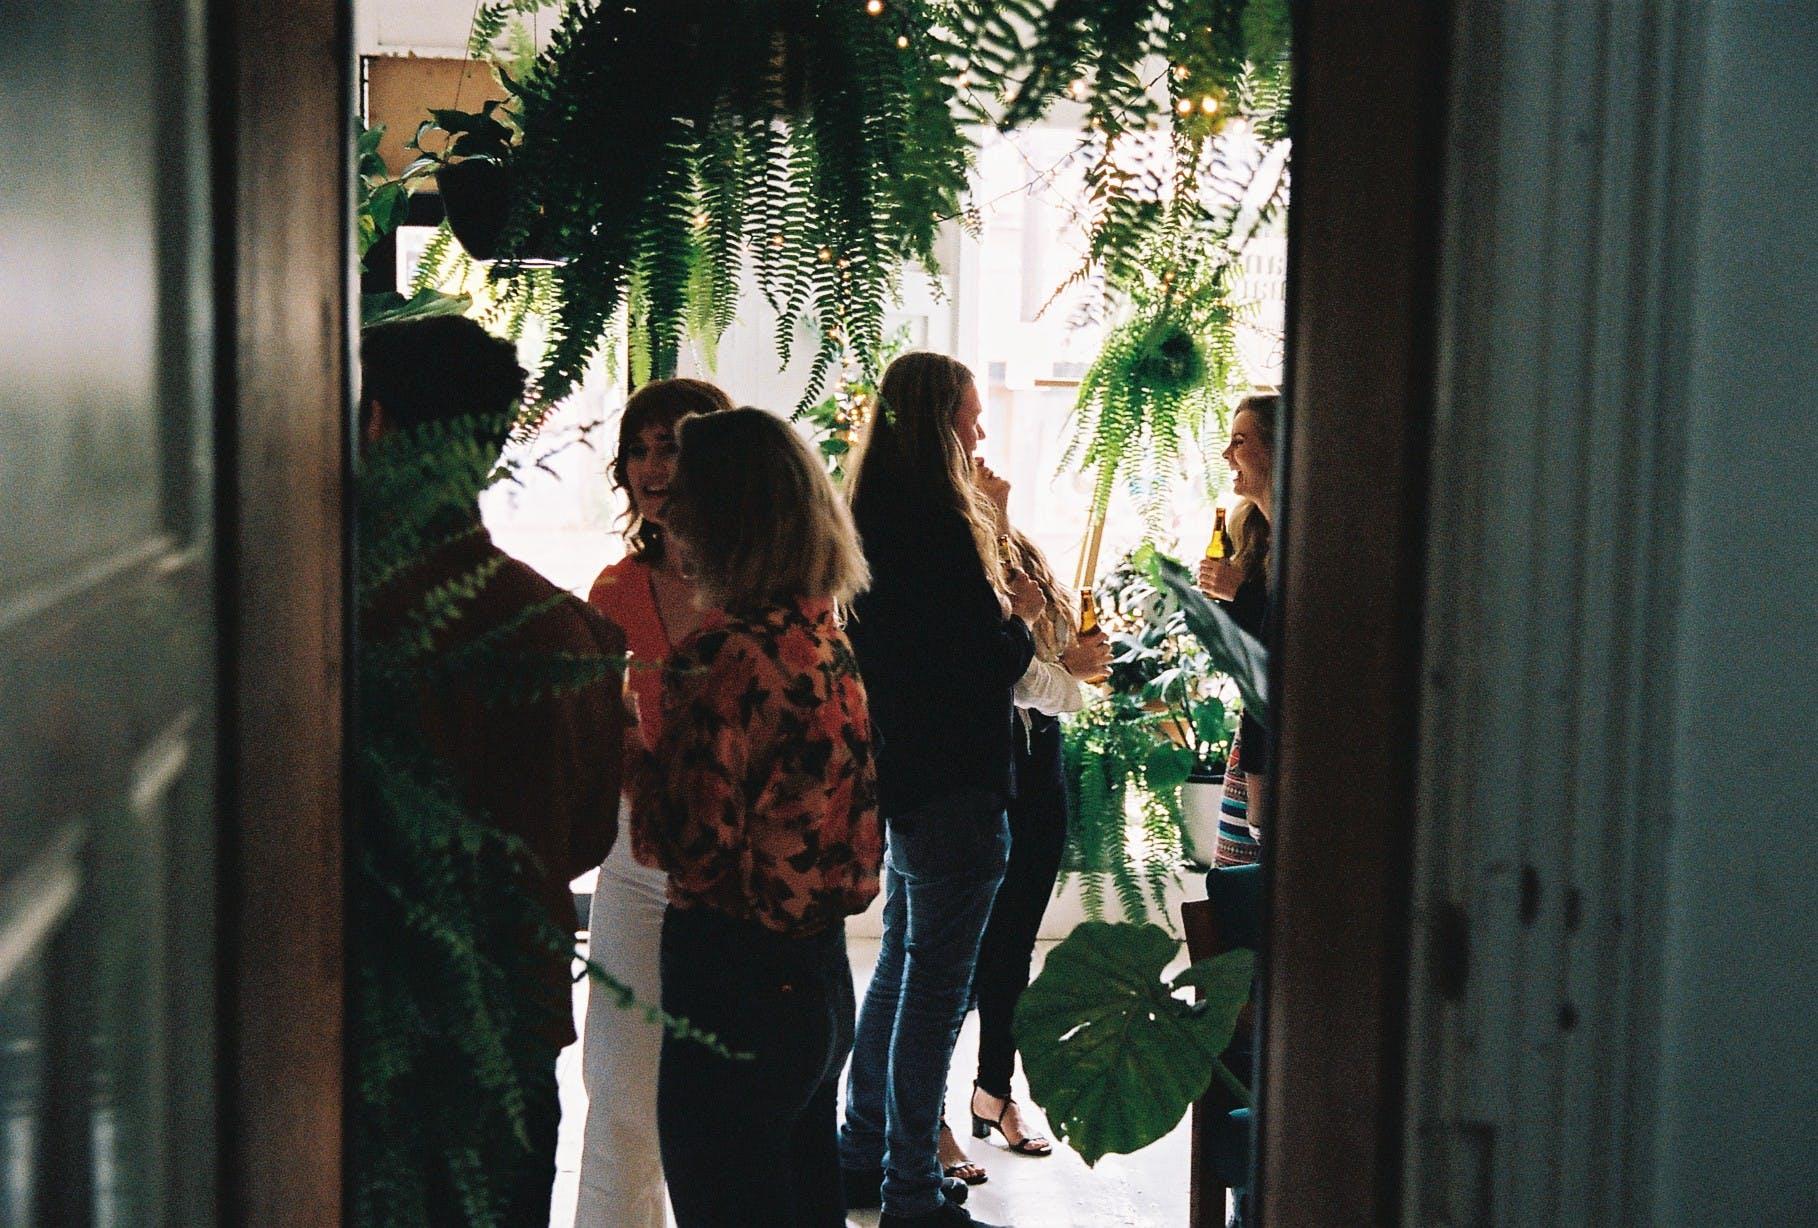 Collingwood Plant Studio, multi-use area at Jenna Holmes, image 12